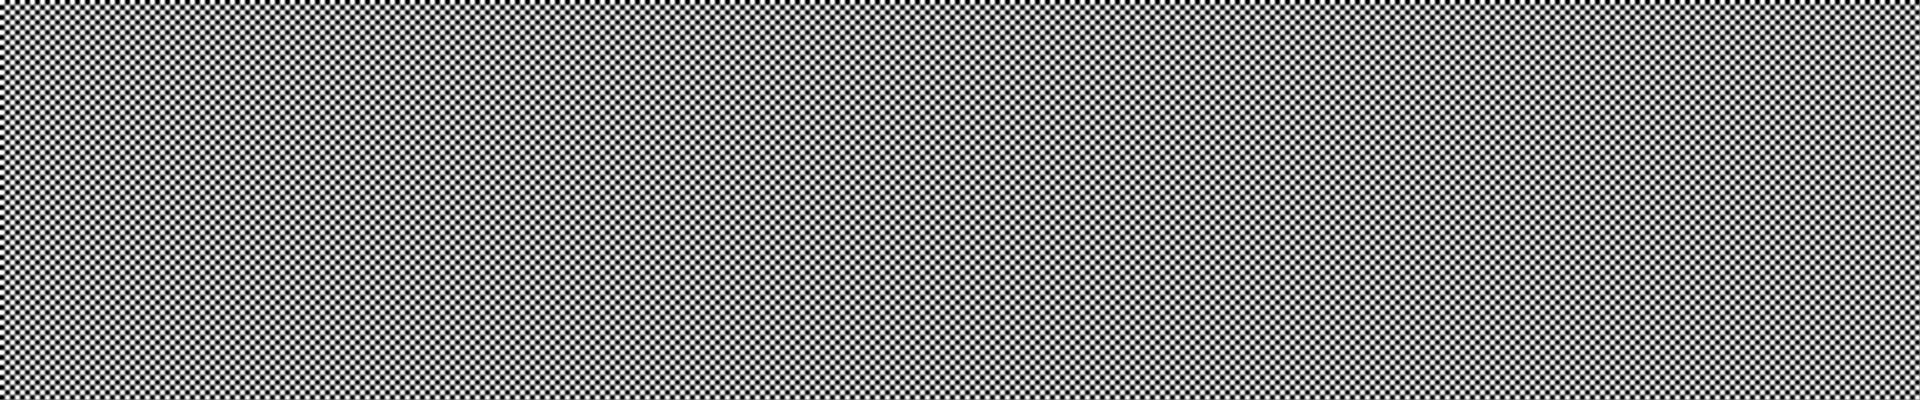 dots raster